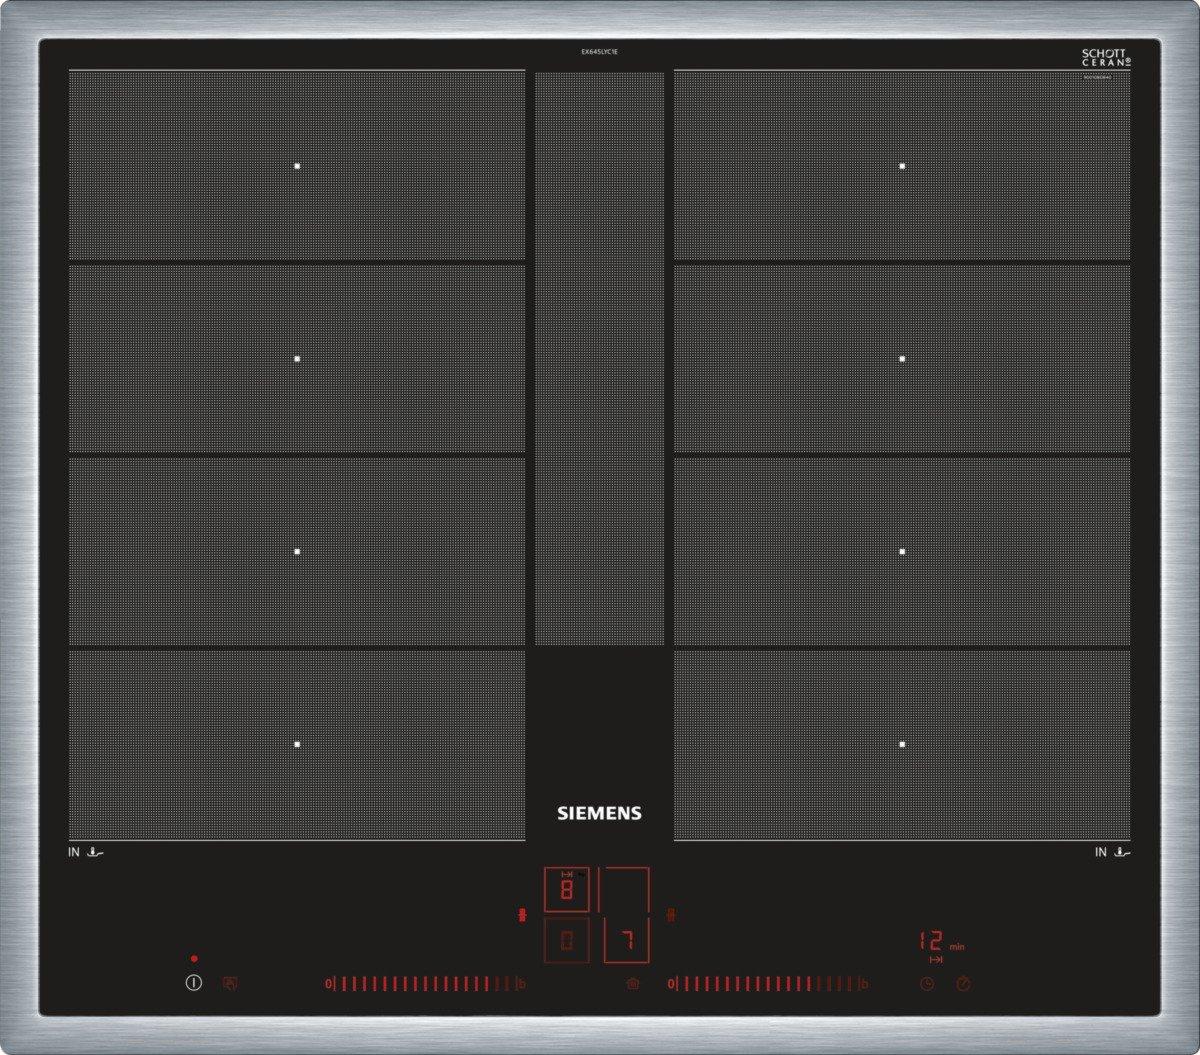 Siemens EX645LYC1E iQ700 Induktionskochfeld, 58,3 cm, Power Boost Funktion, schwarz